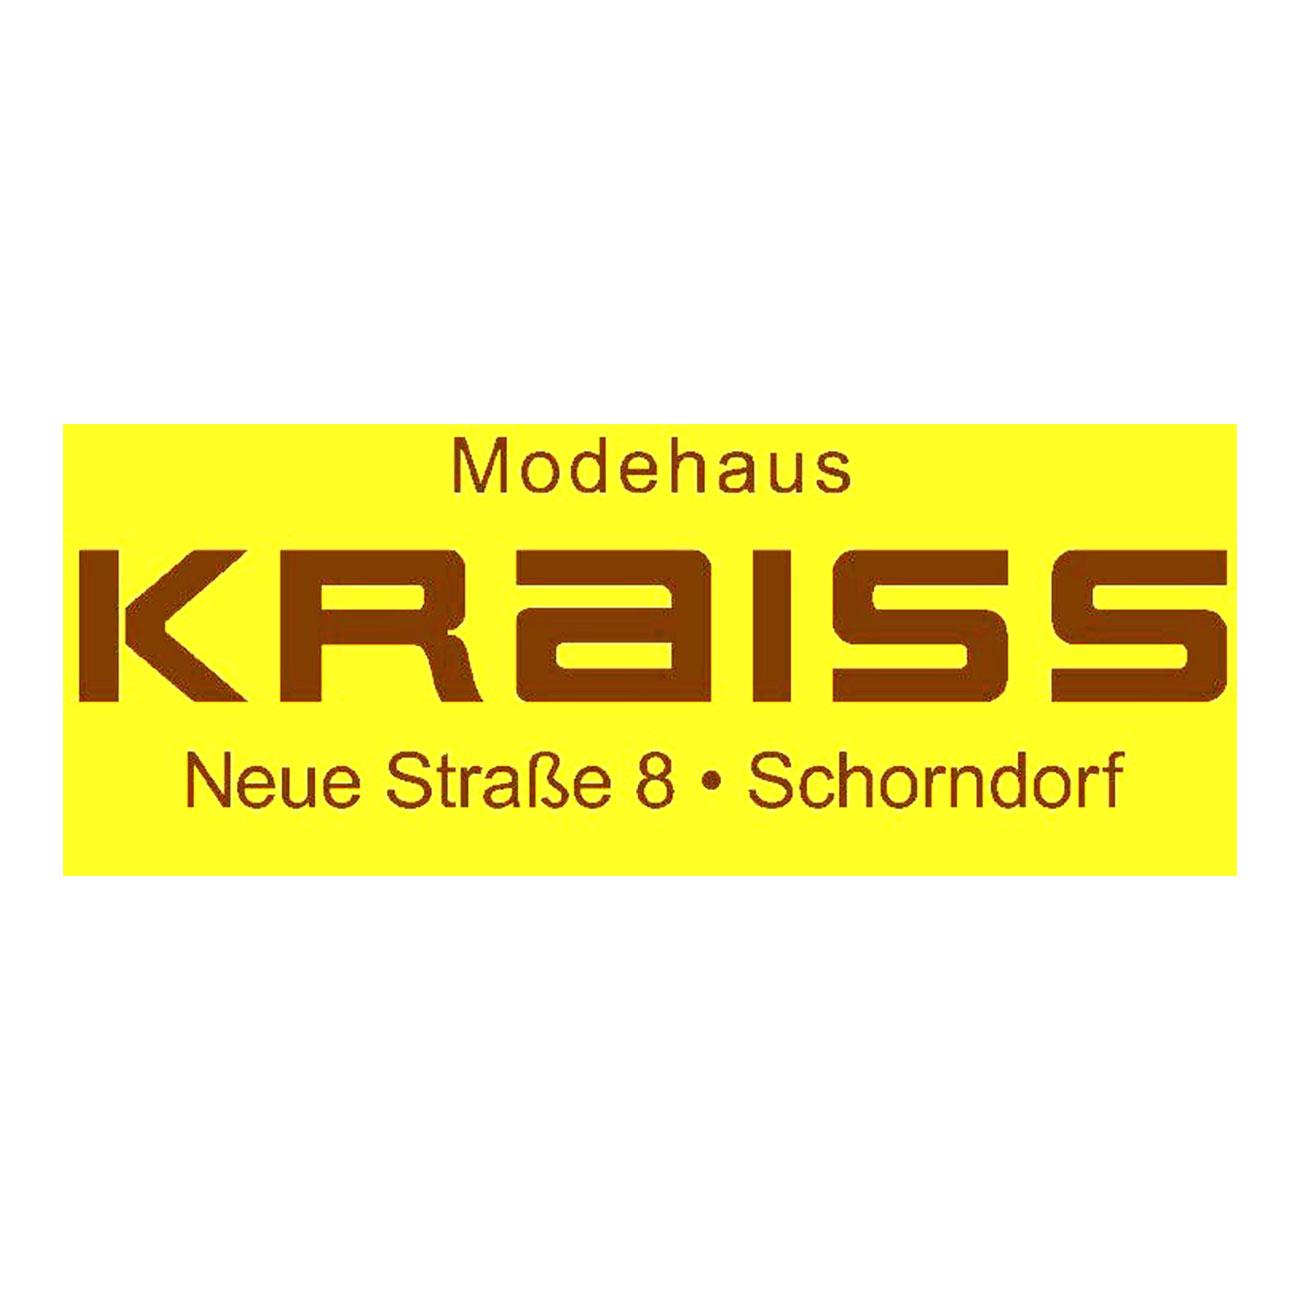 Modehaus Kraiss